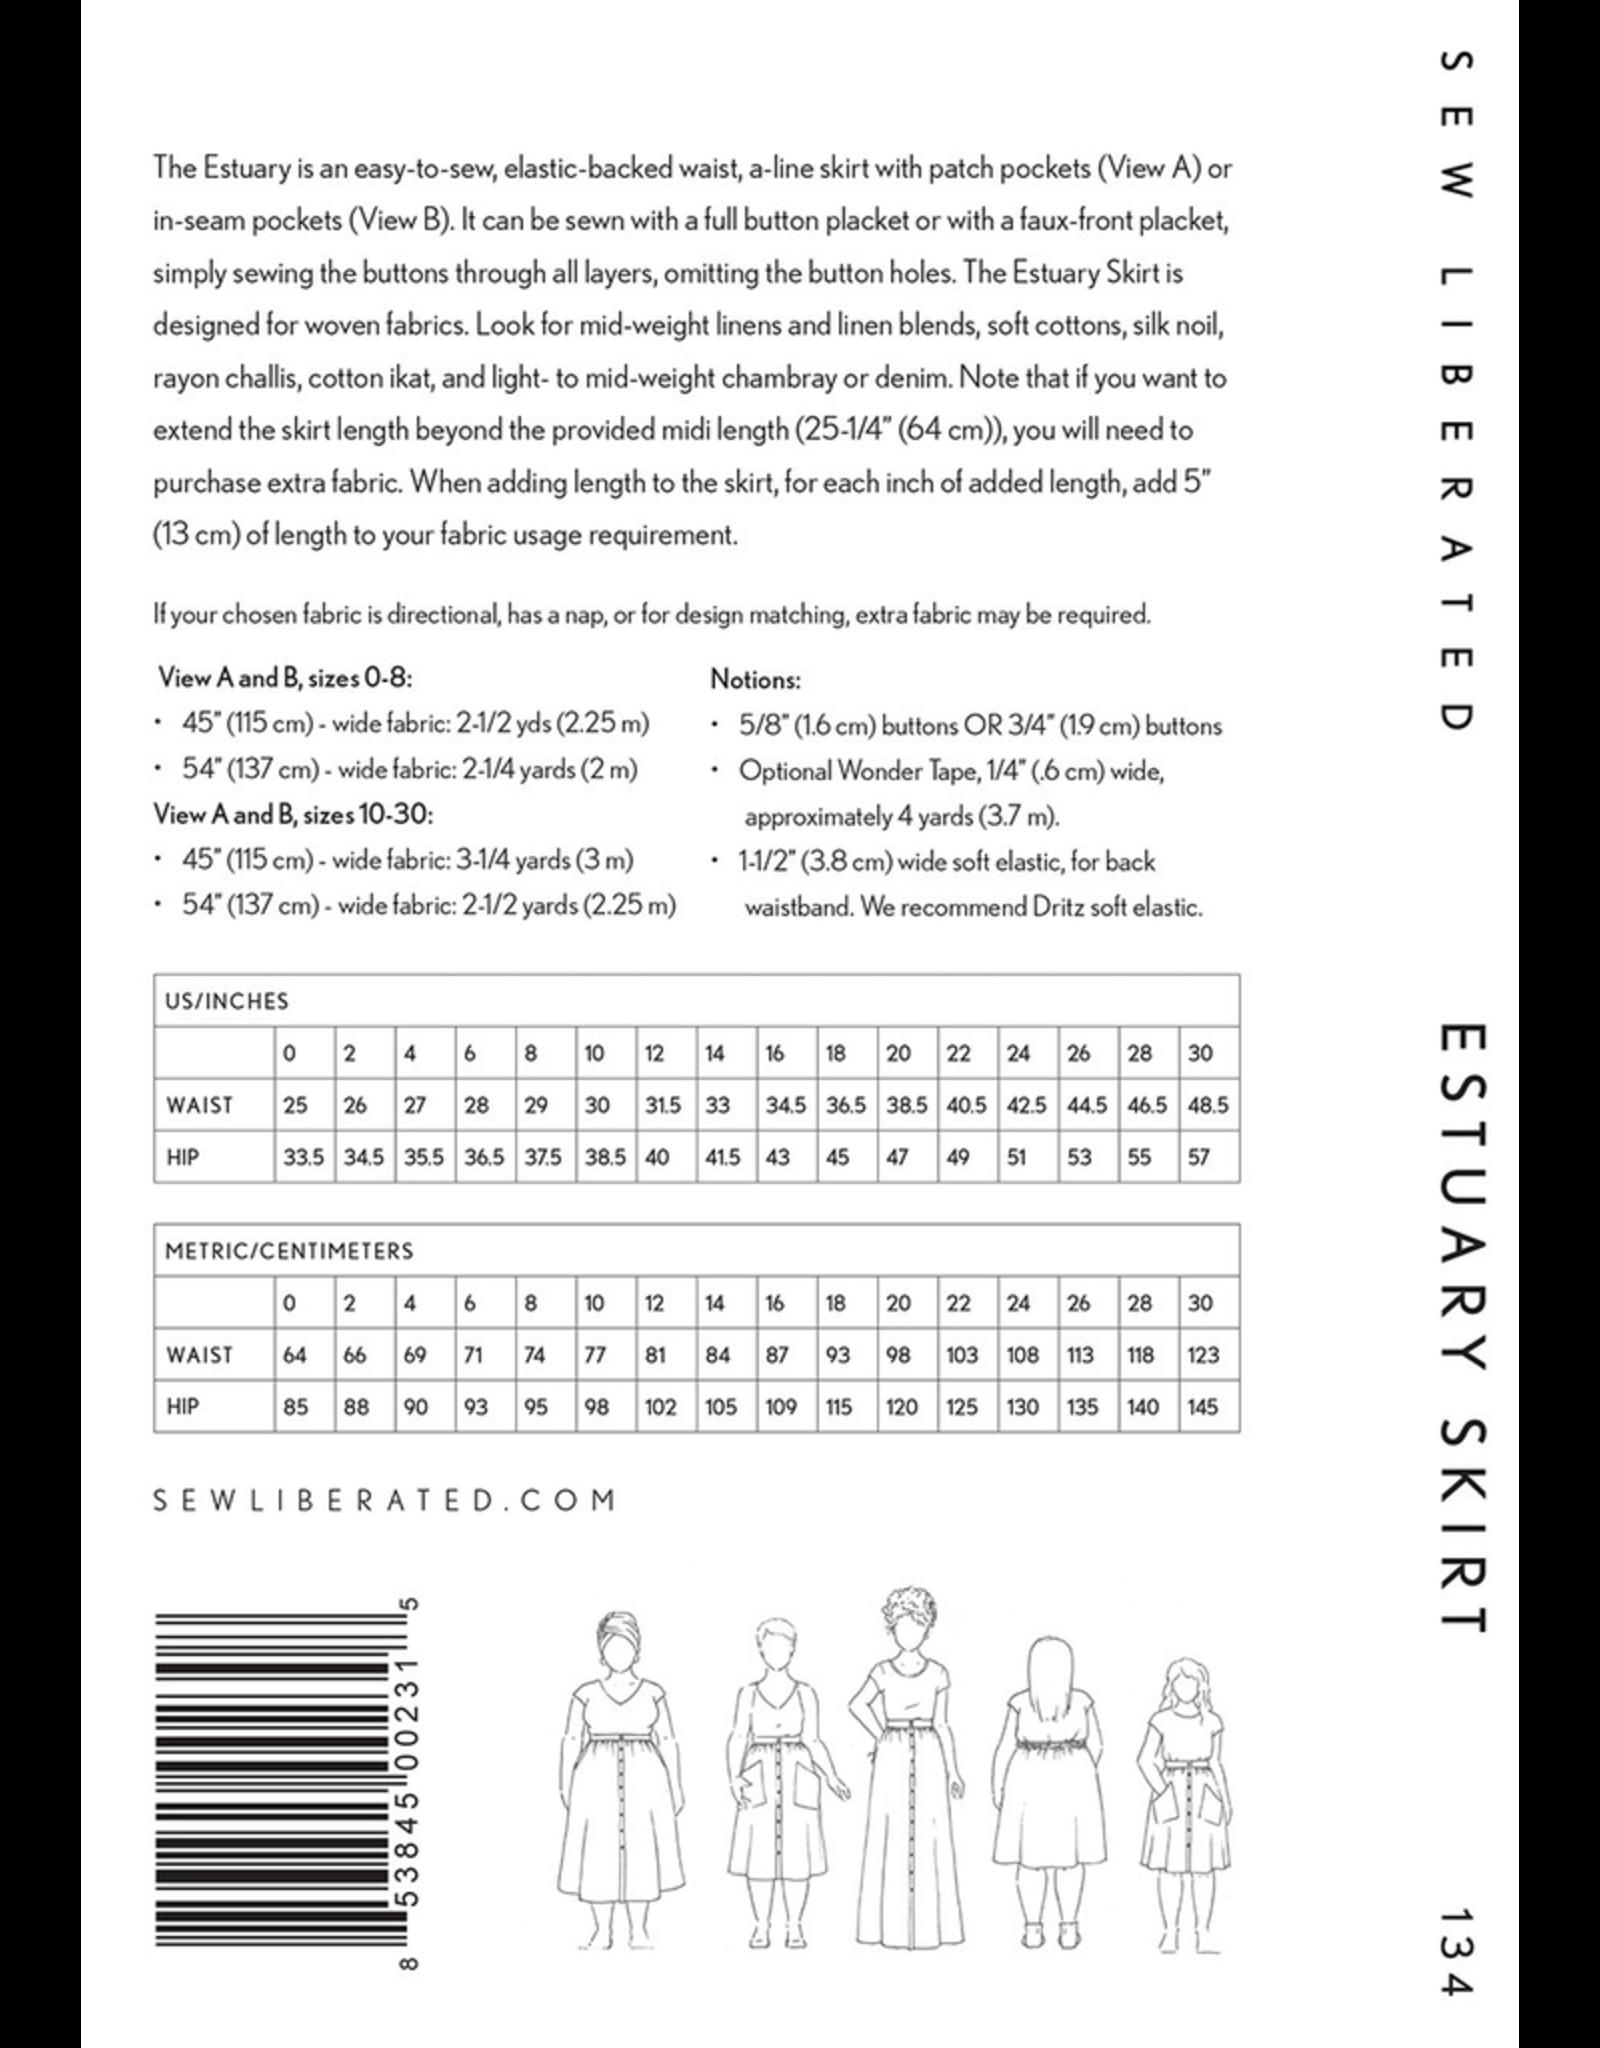 Sew Liberated Estuary Skirt Pattern